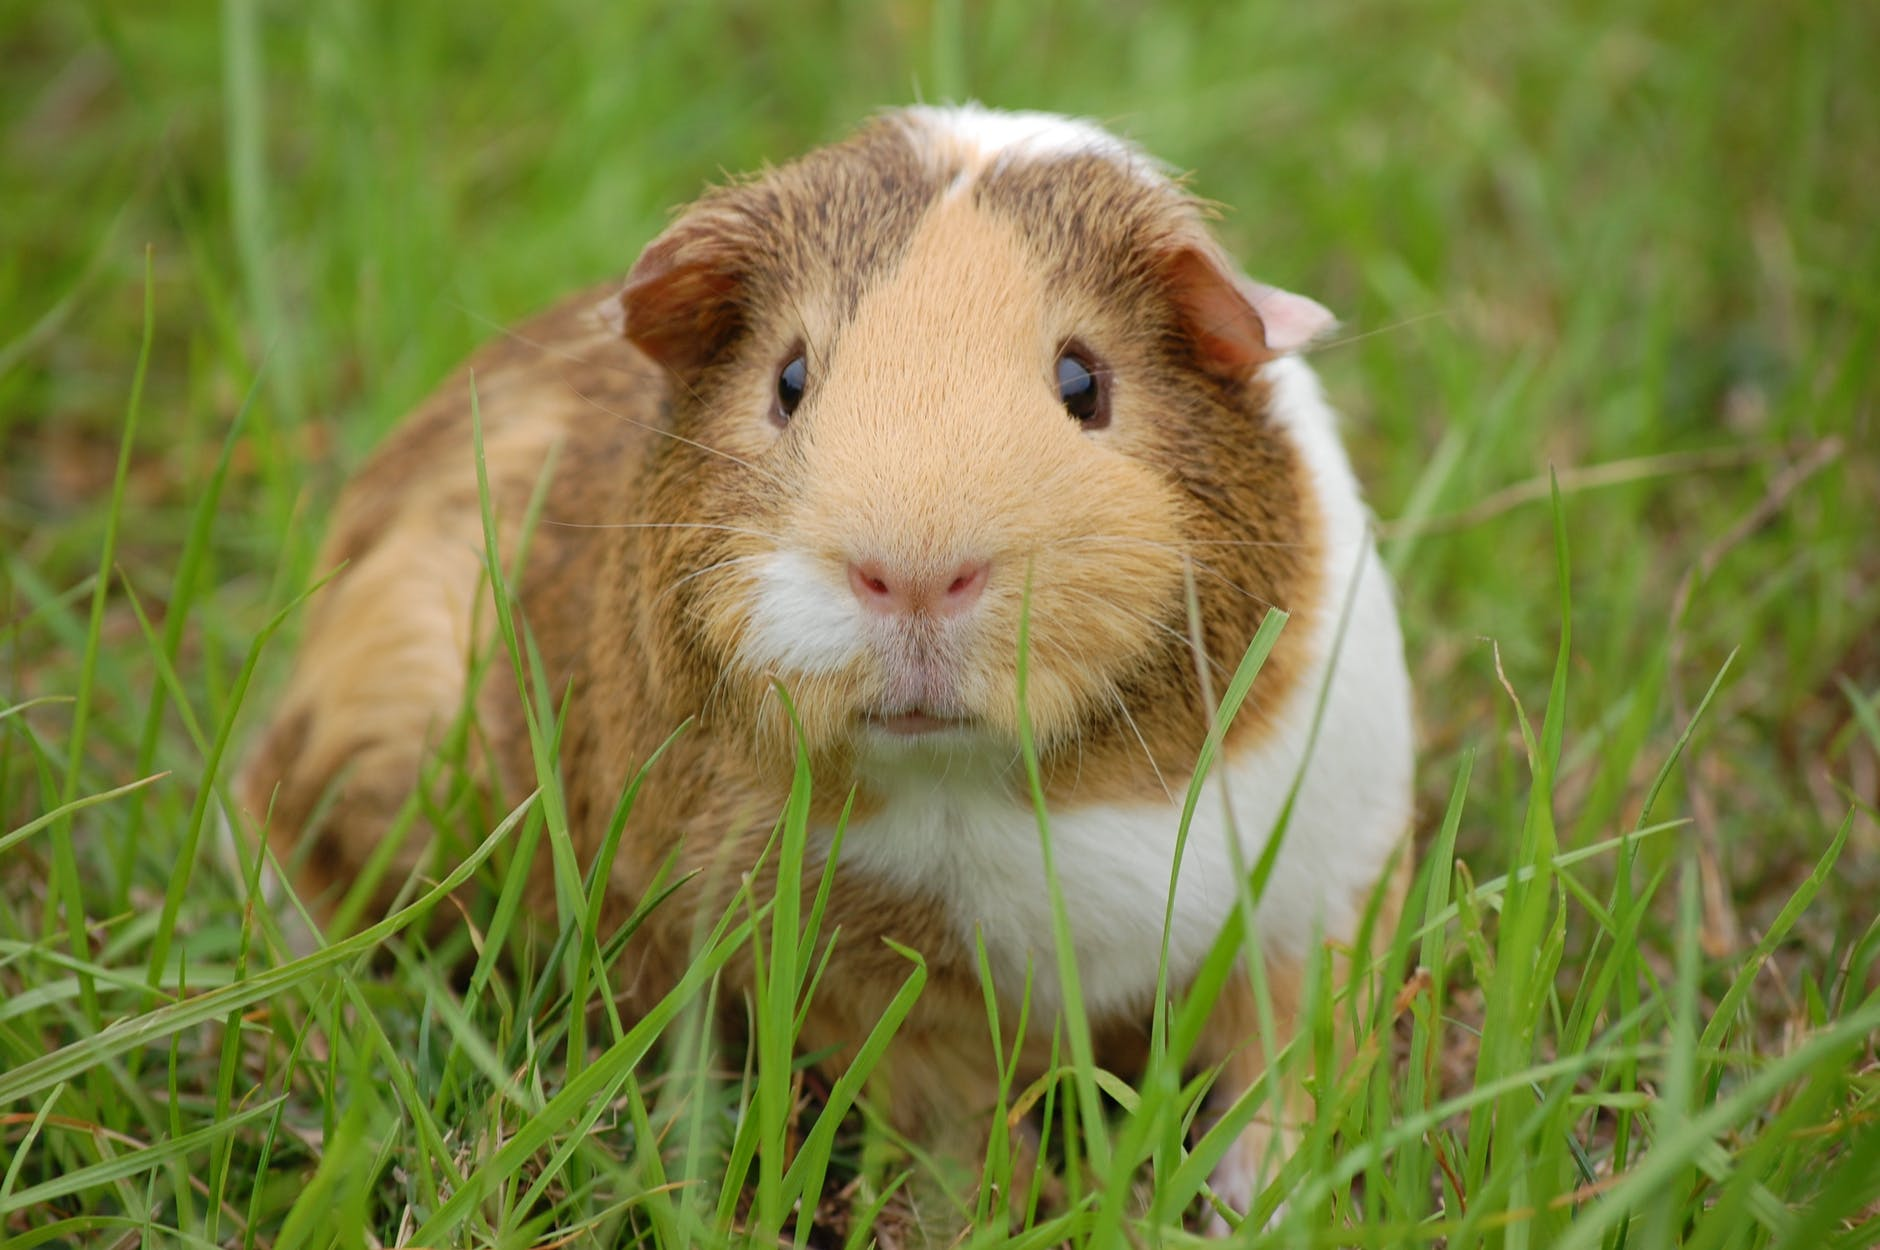 animal pet rodent mammal